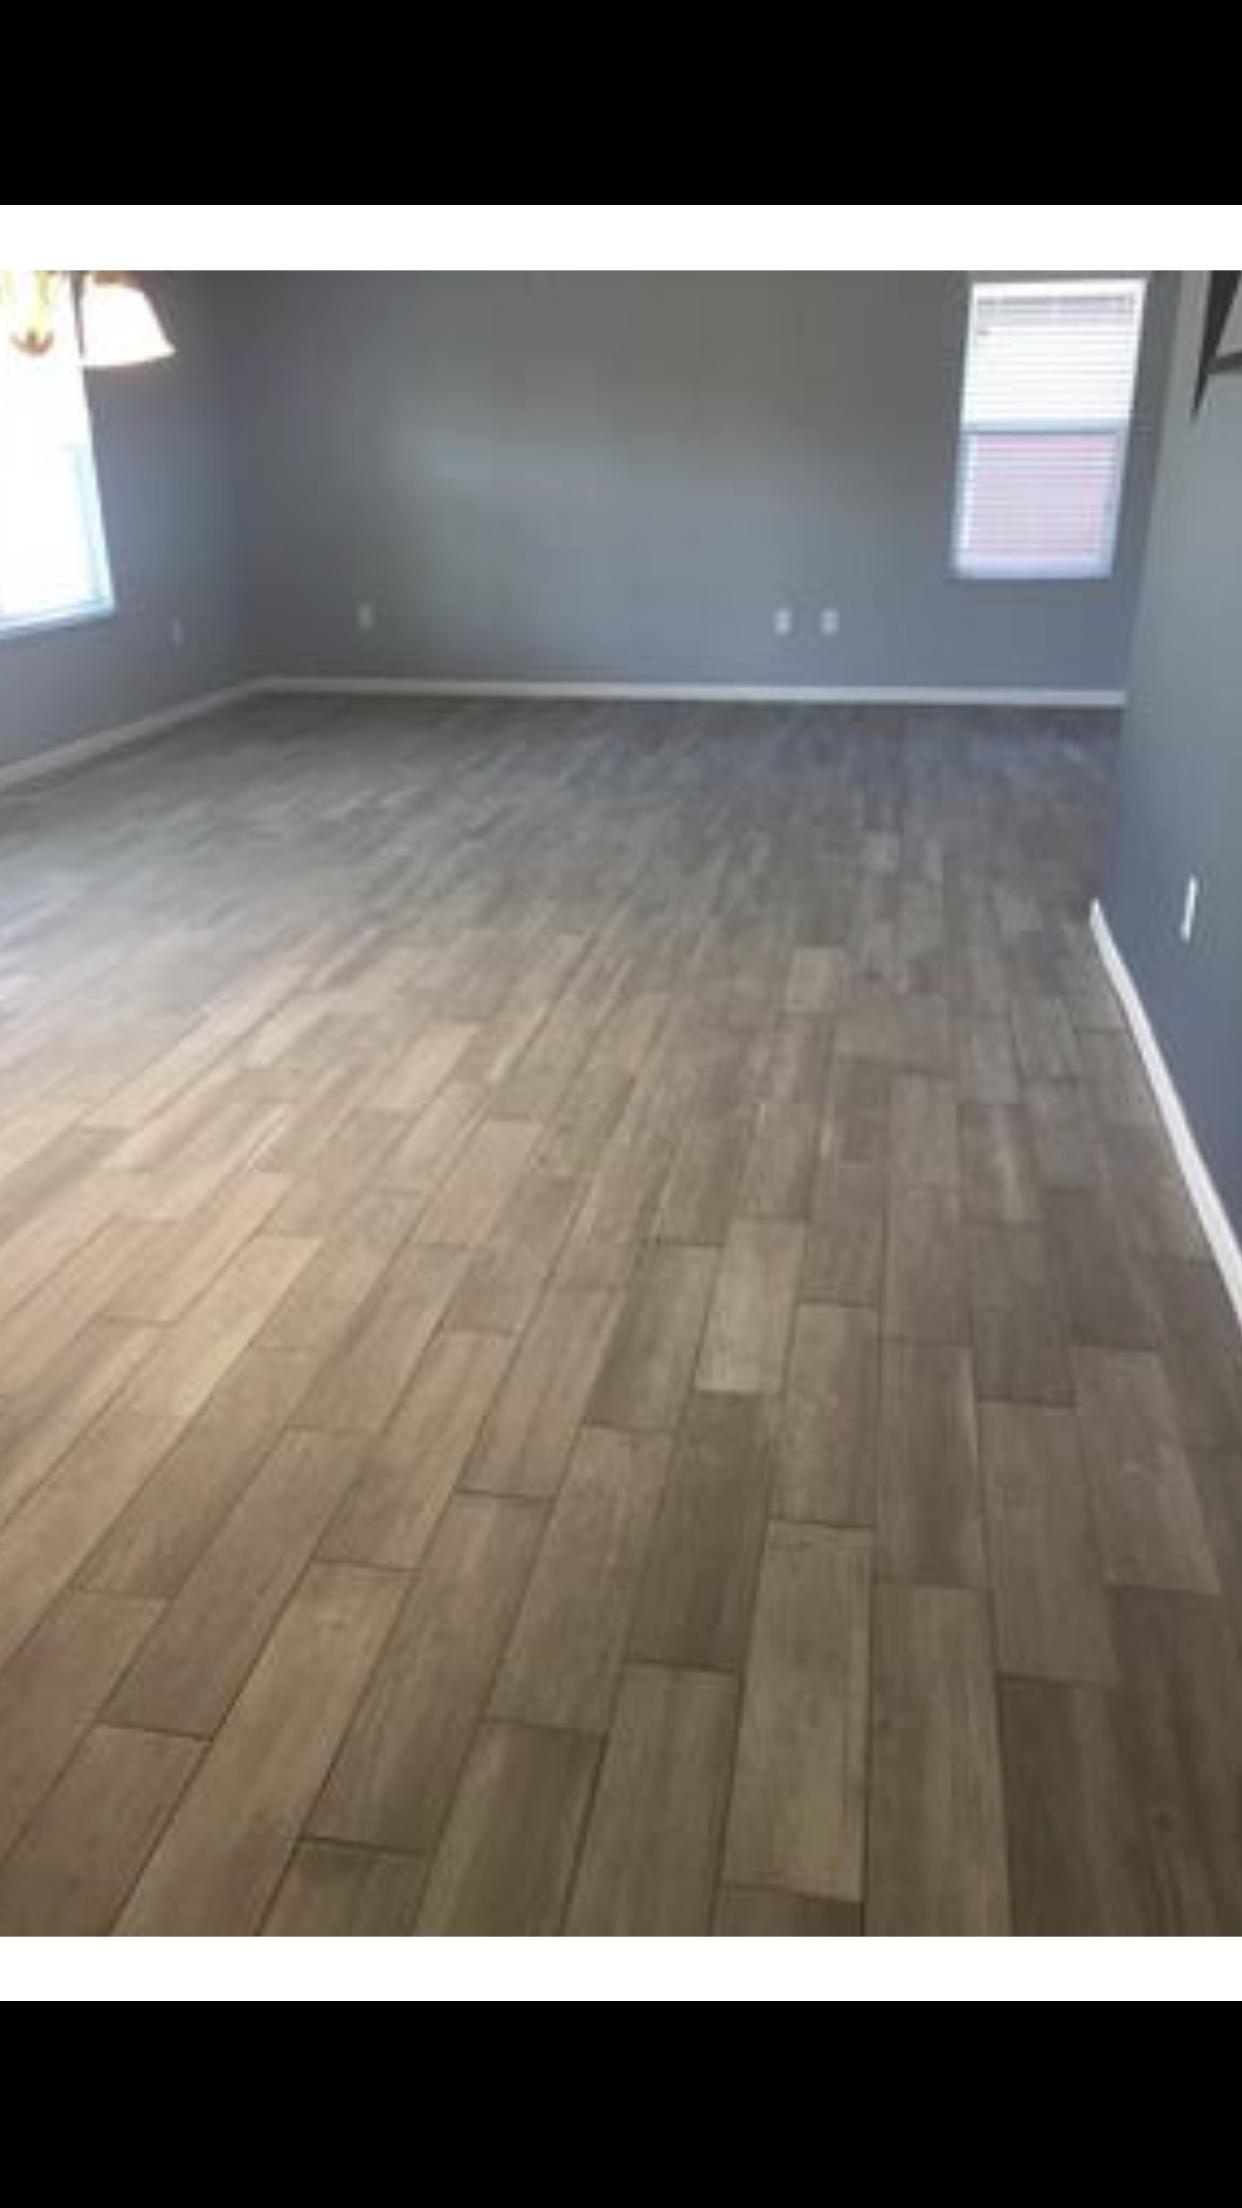 Del Conca Woods Vintage Gray Wood Look Porcelain Floor and